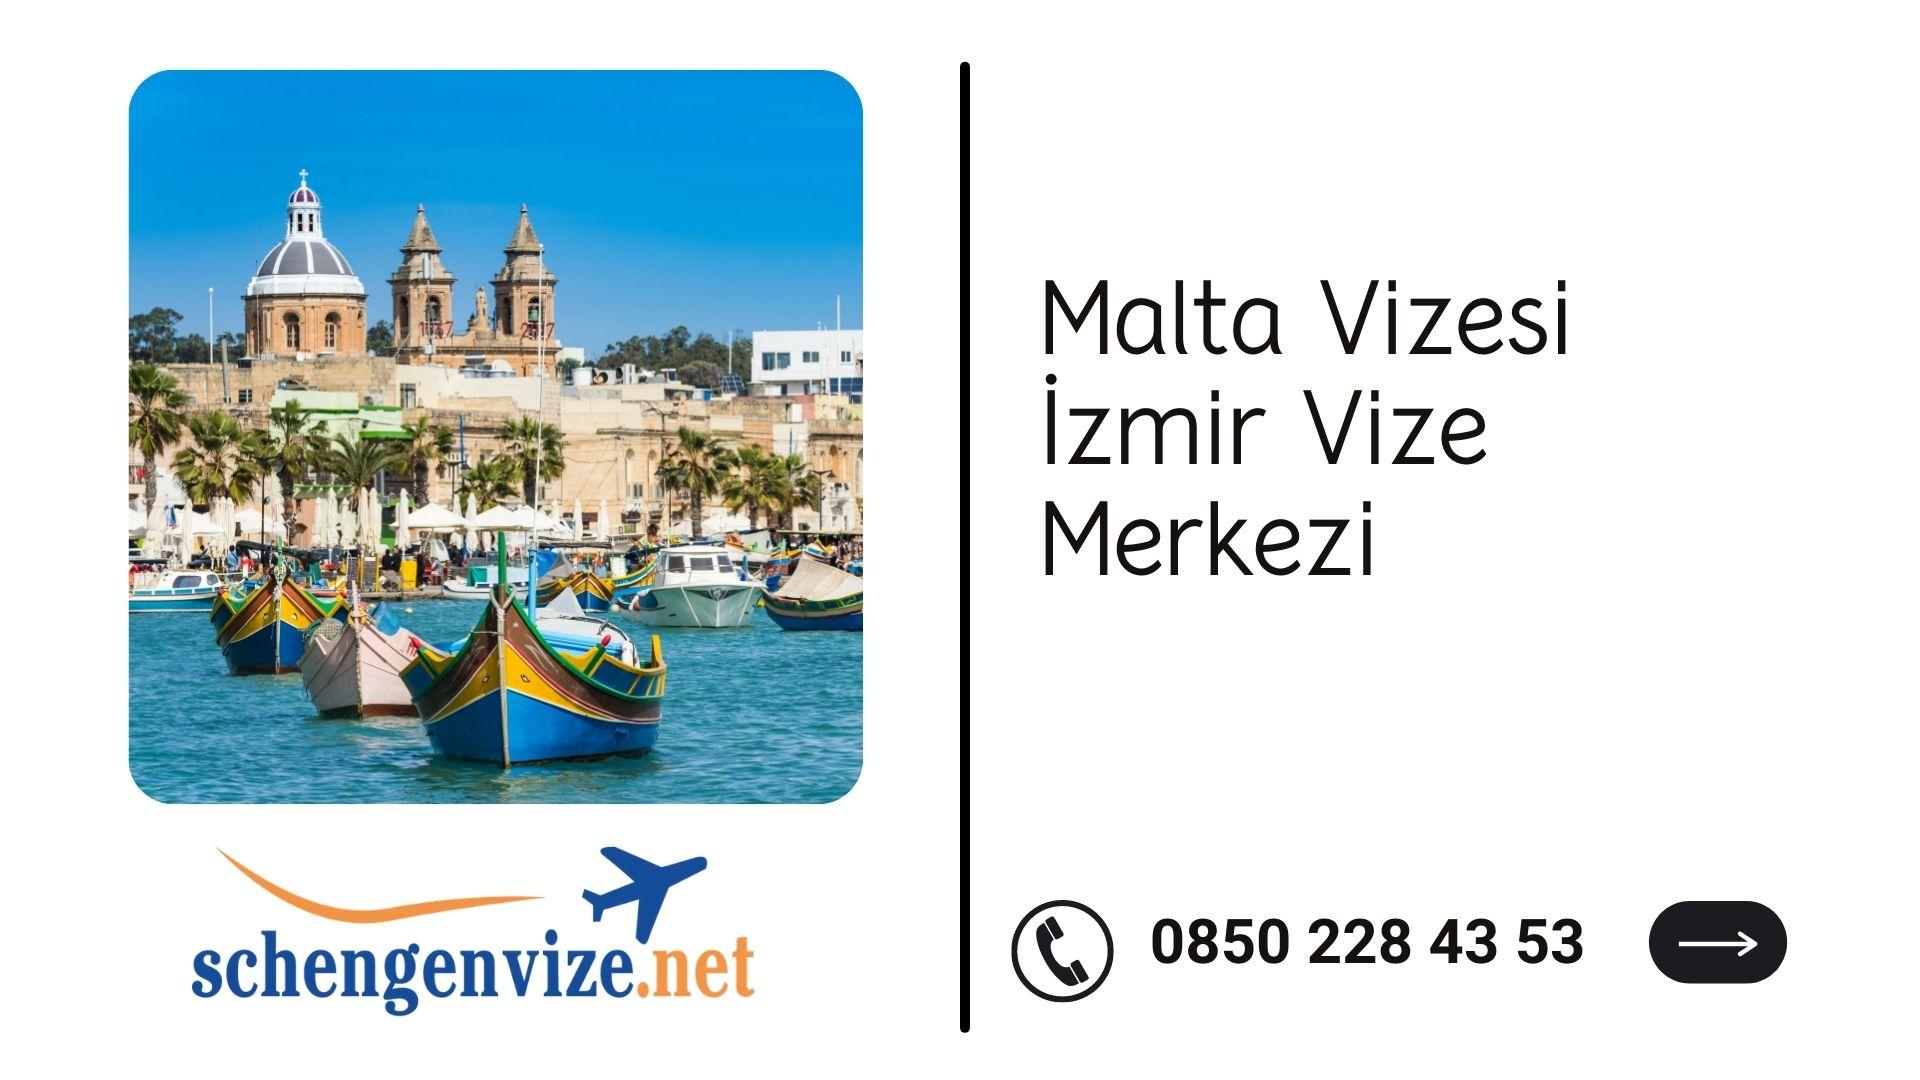 Malta Vizesi İzmir Vize Merkezi